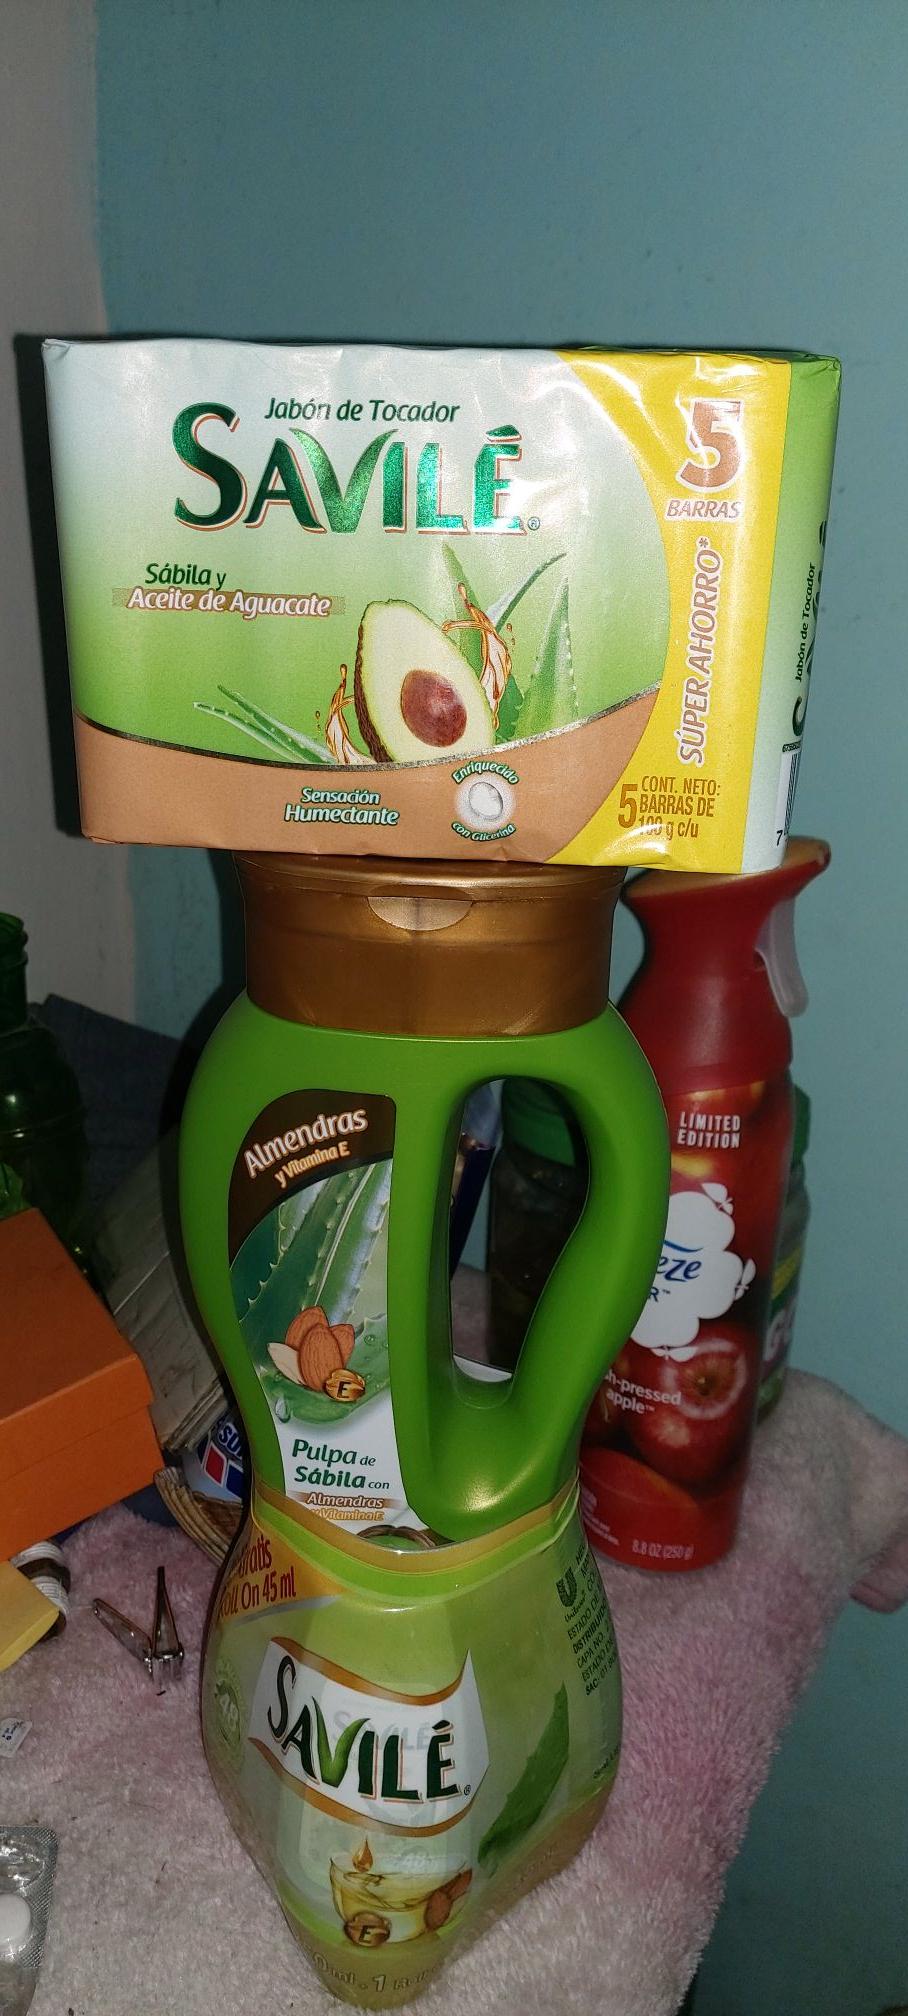 Soriana: Shampoo Savile incluye Desodorante.